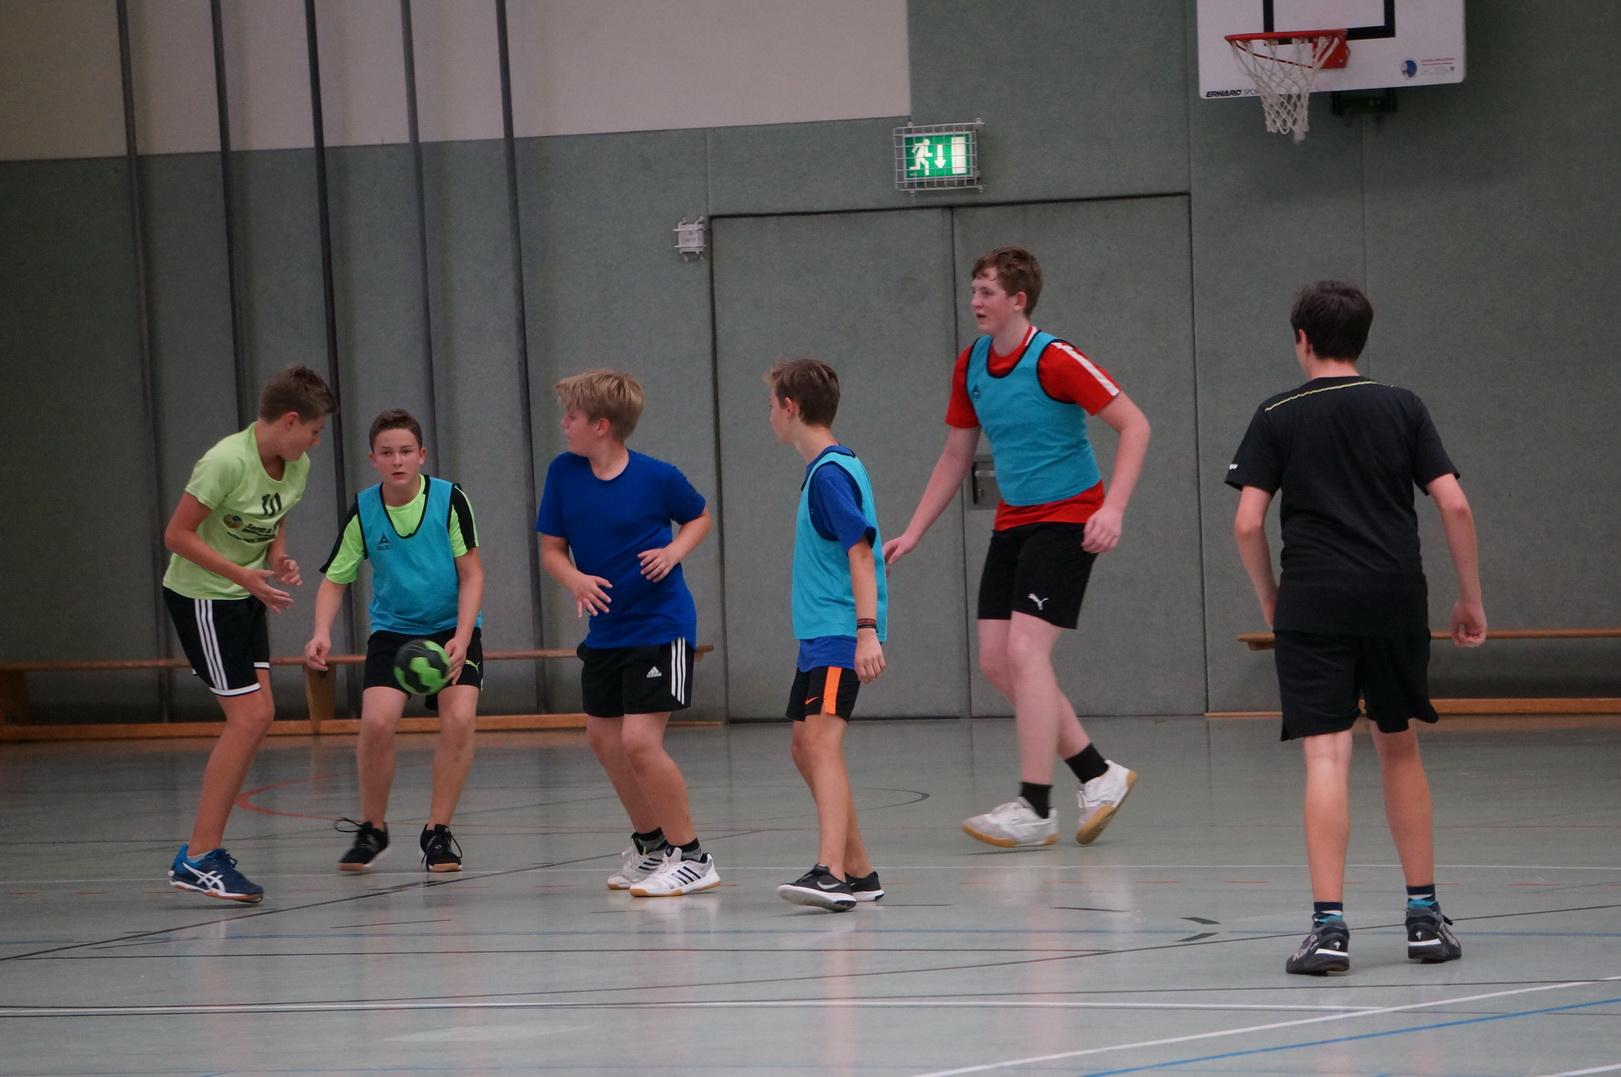 201808_Handballcamp_SDH_MG_112w